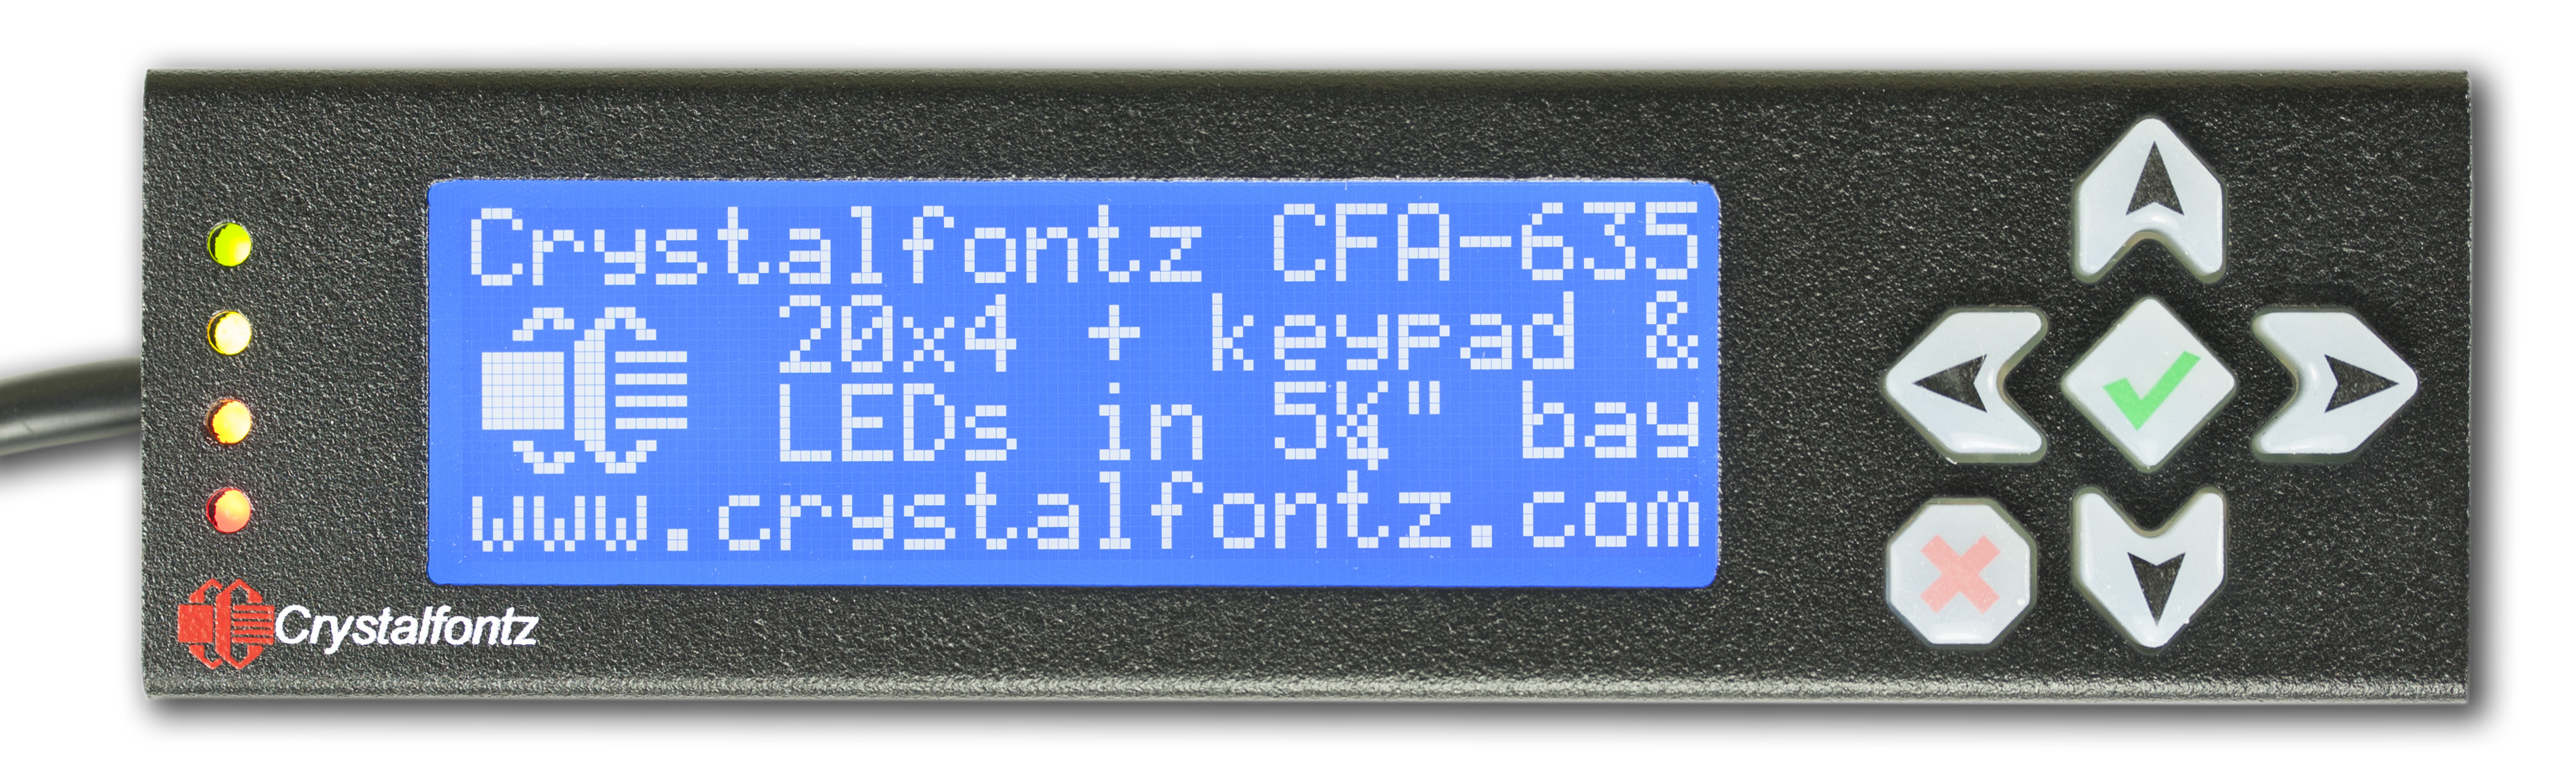 Crystalfontz LCD Module USB Driver Windows XP